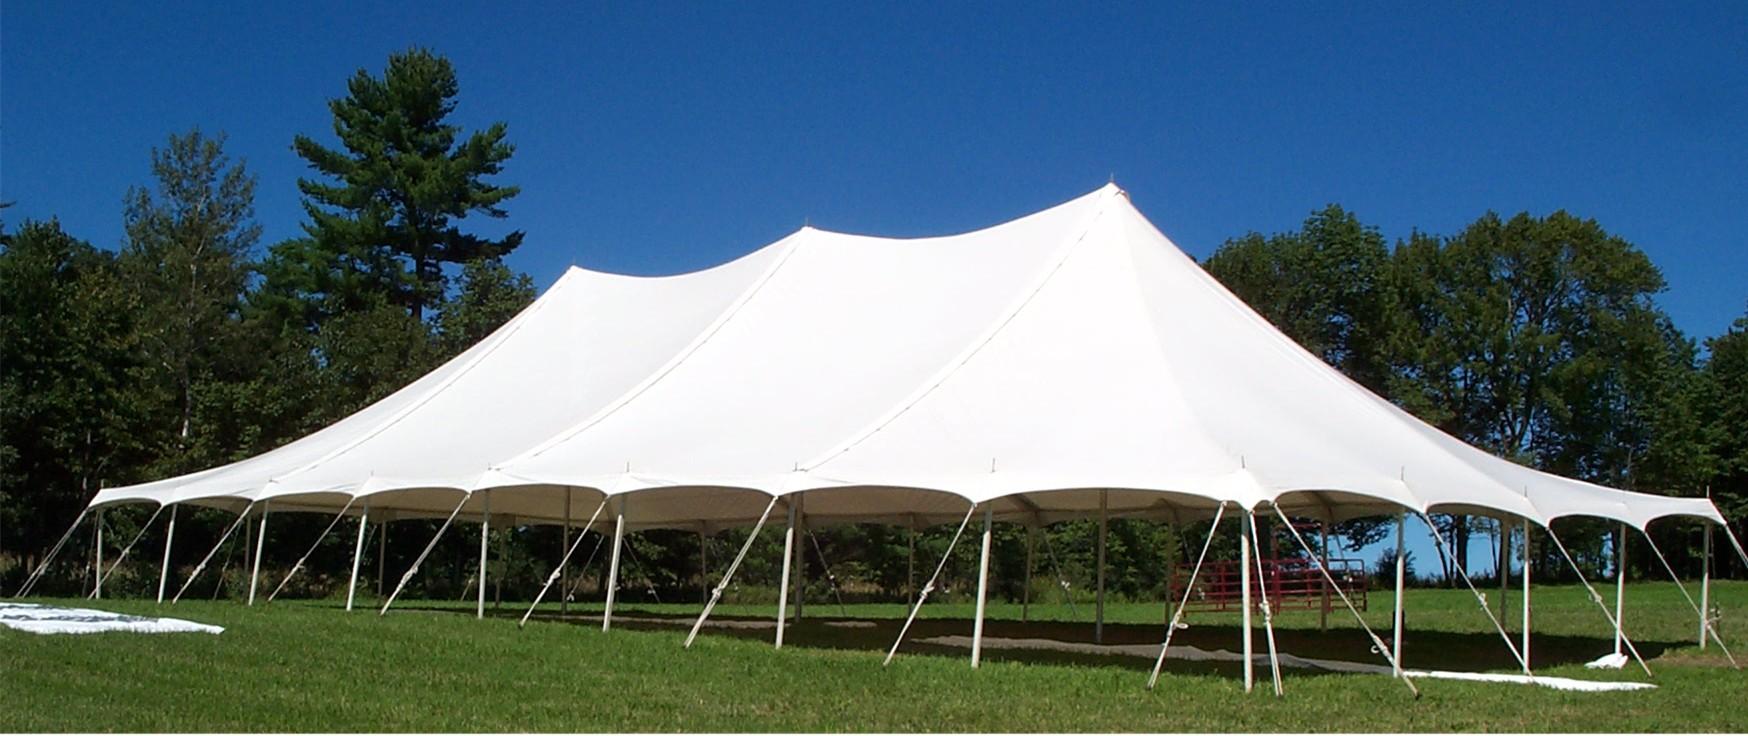 Tire Places Open Today >> Action Party Tent Rentals Pahoa, HI 96778 - YP.com